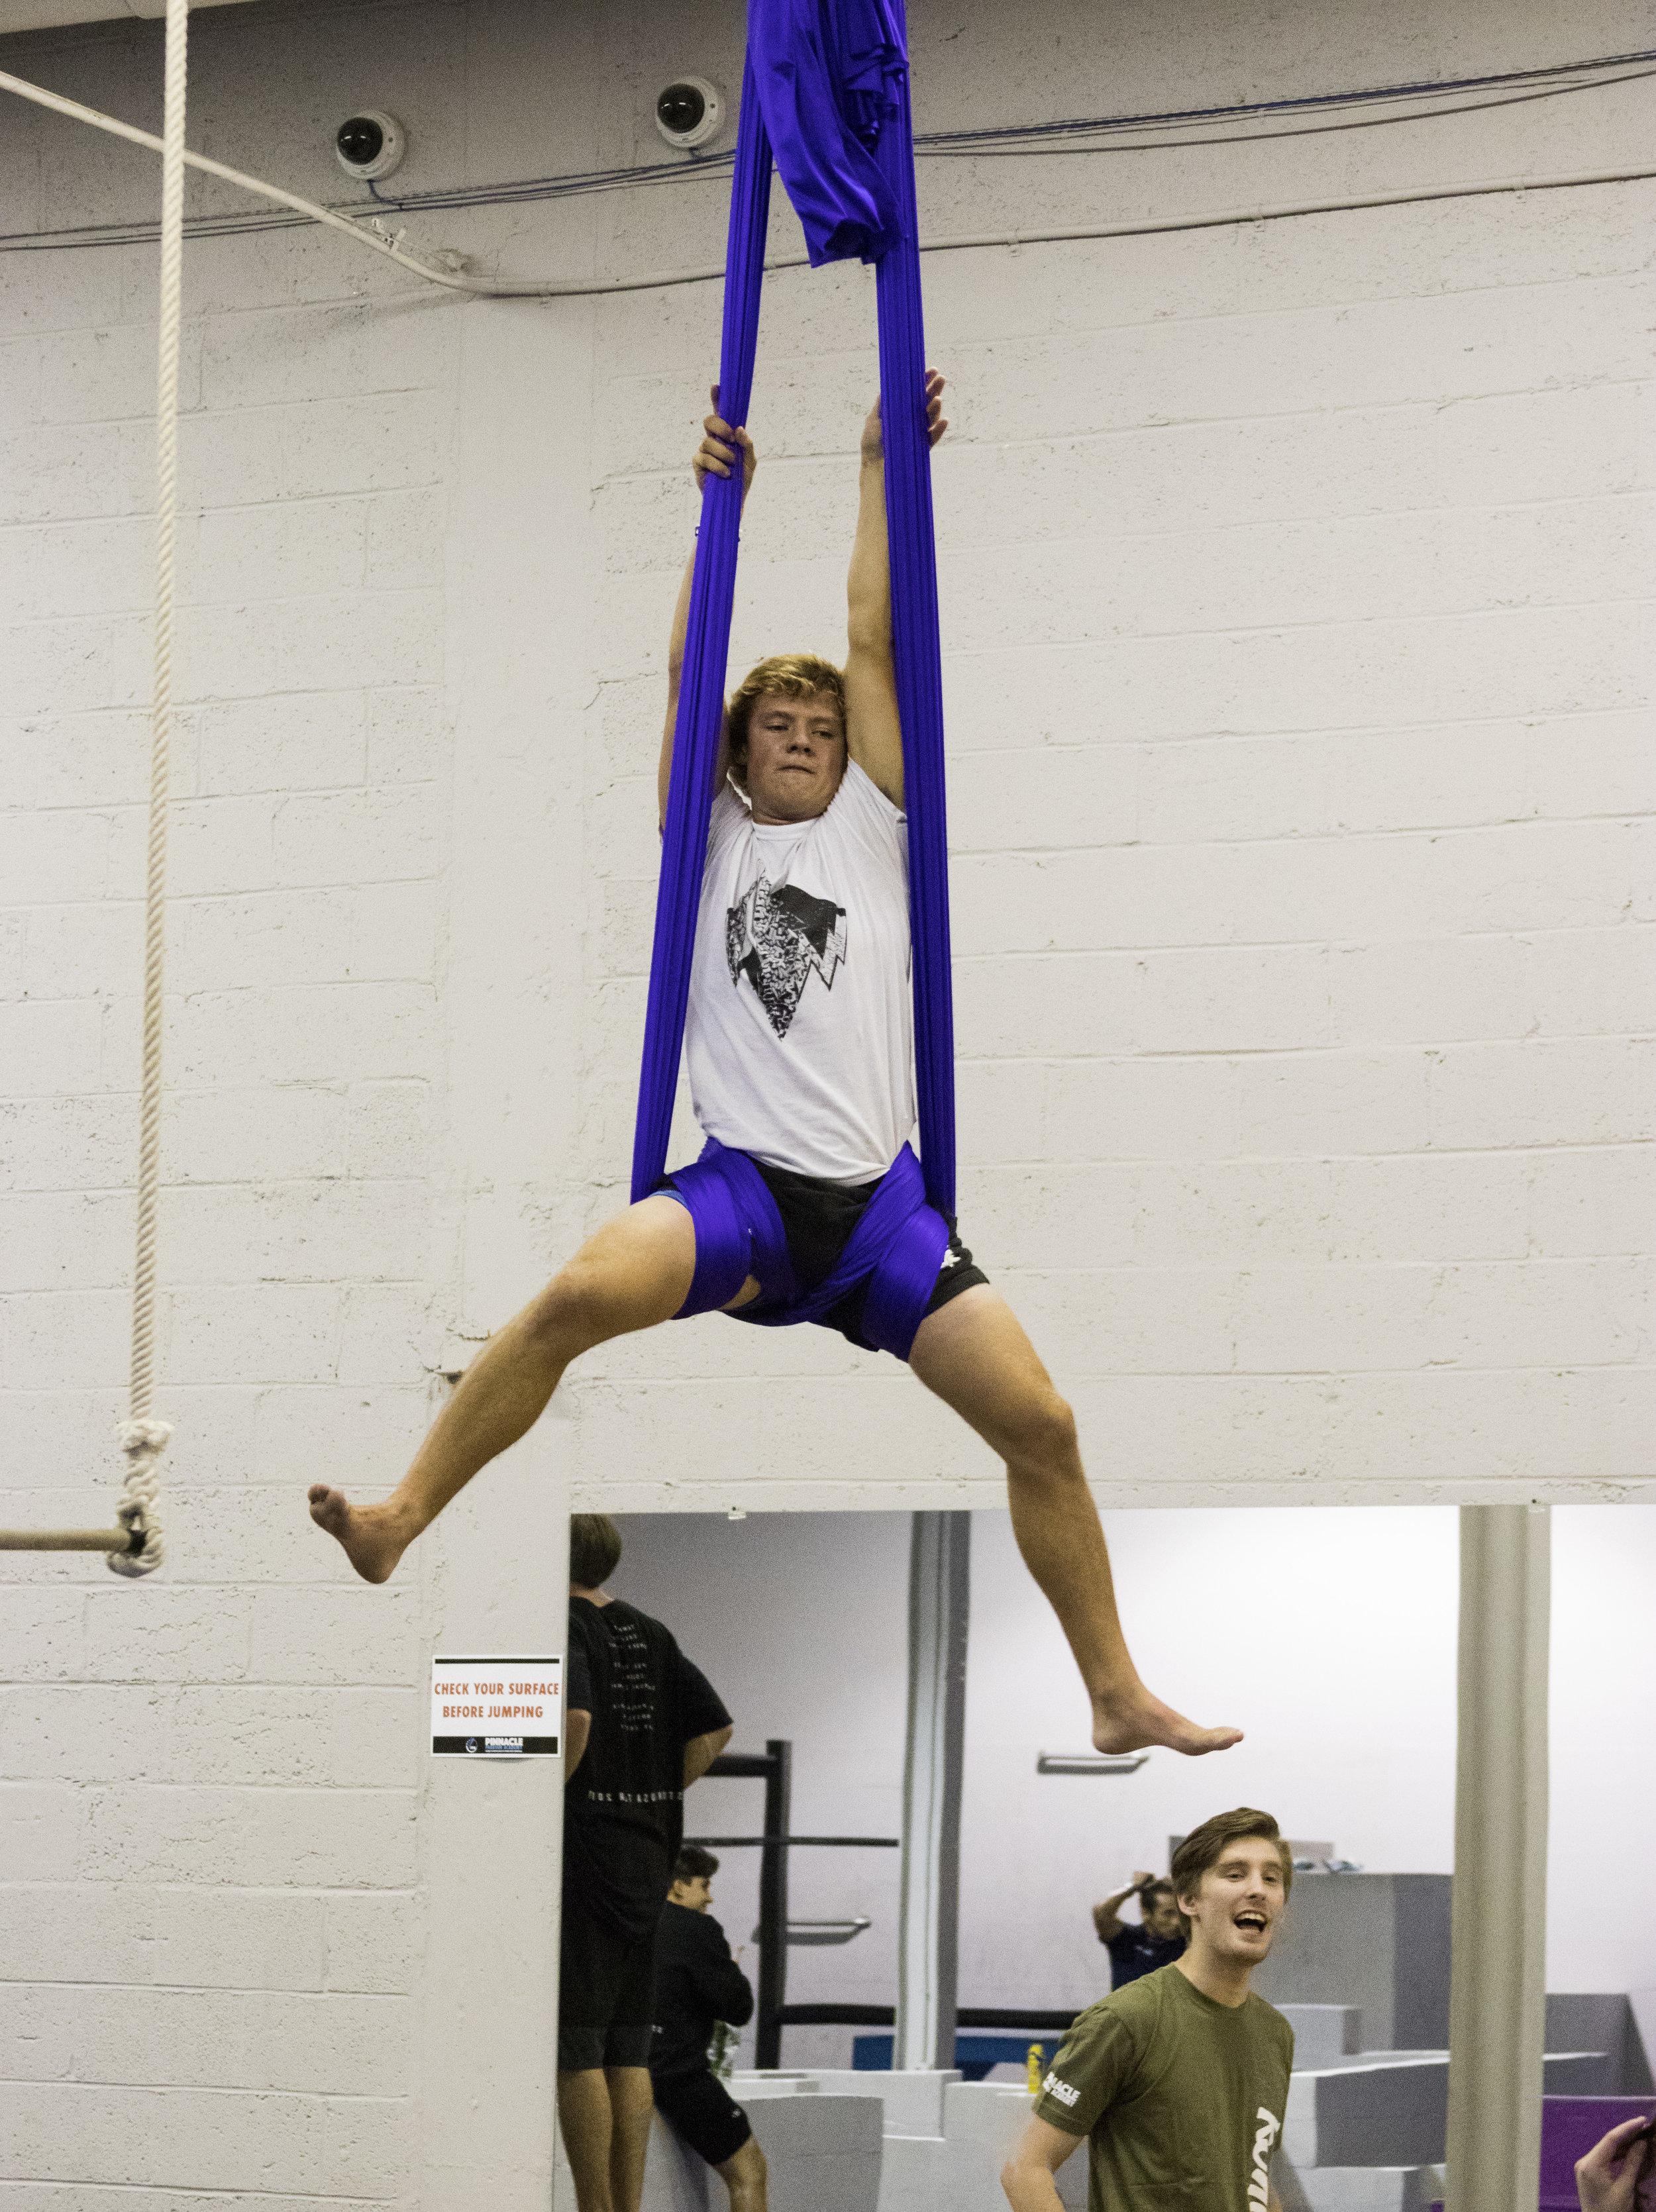 Aerial Silks is for Everyone!